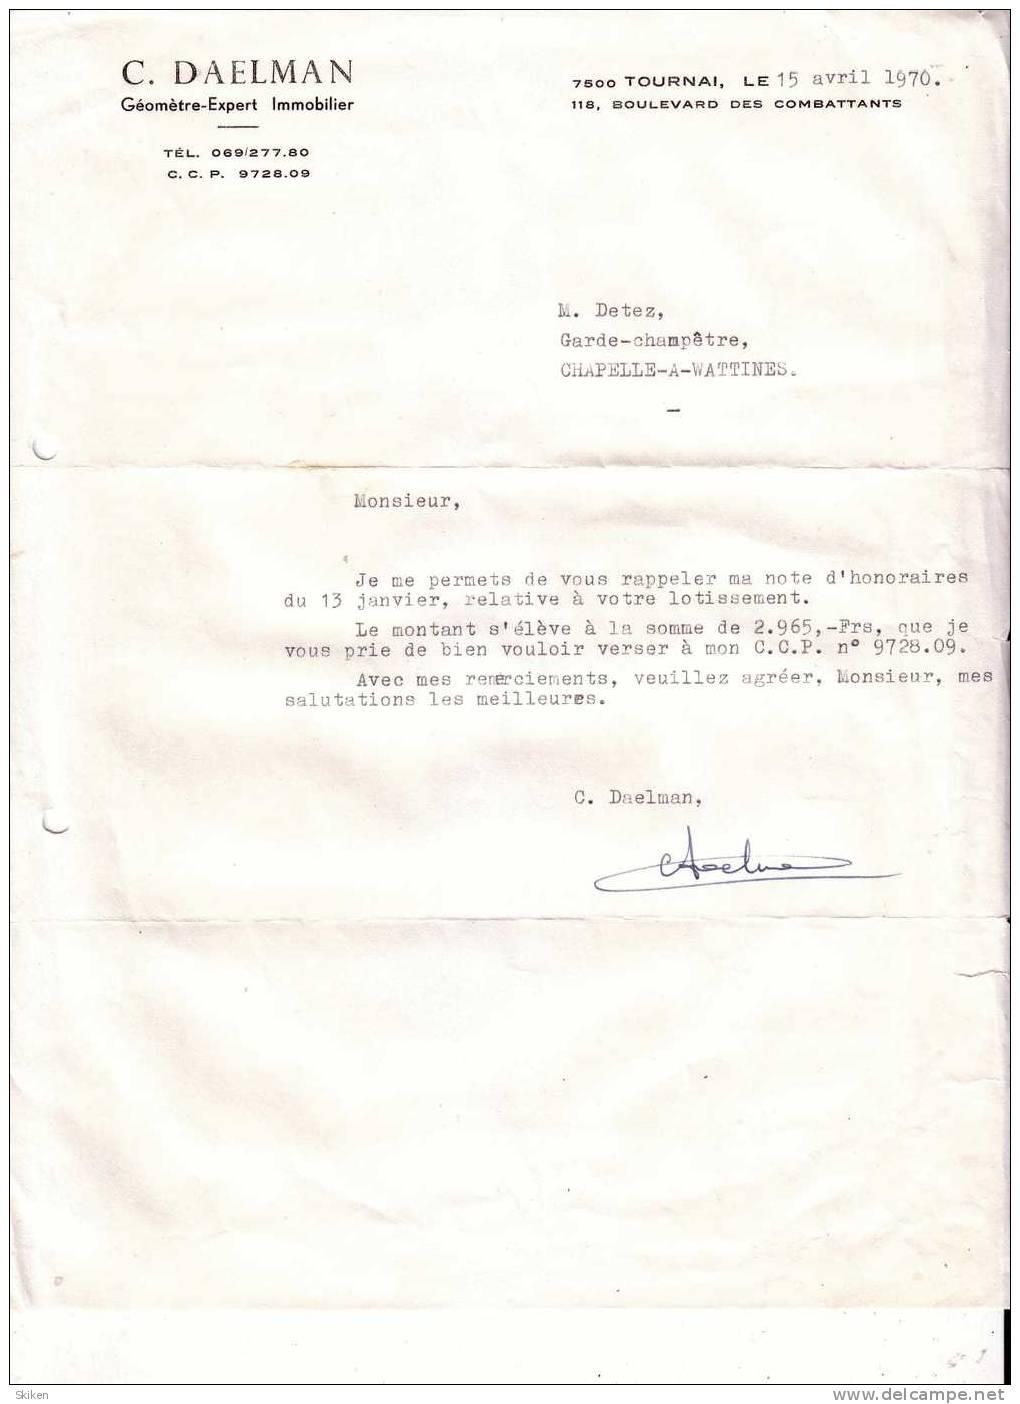 TOURNAI  C. DAELMAN  Geometre Expert Immobilier  15.04.1970 - Royaume-Uni